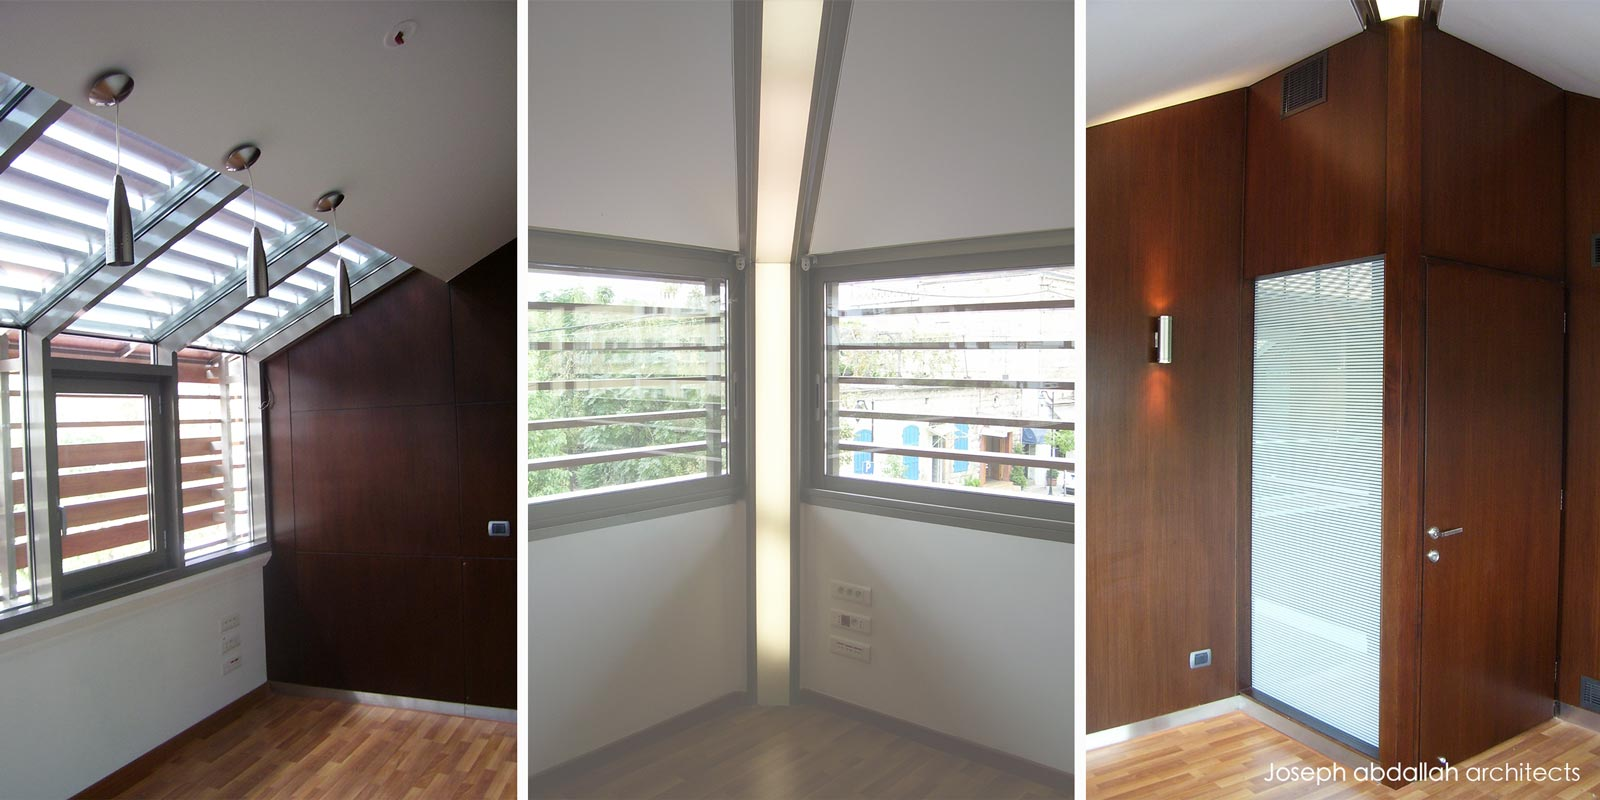 bank-lcb-sgbl-apotres-restoration-architecture-joseph-abdallah-architects-18